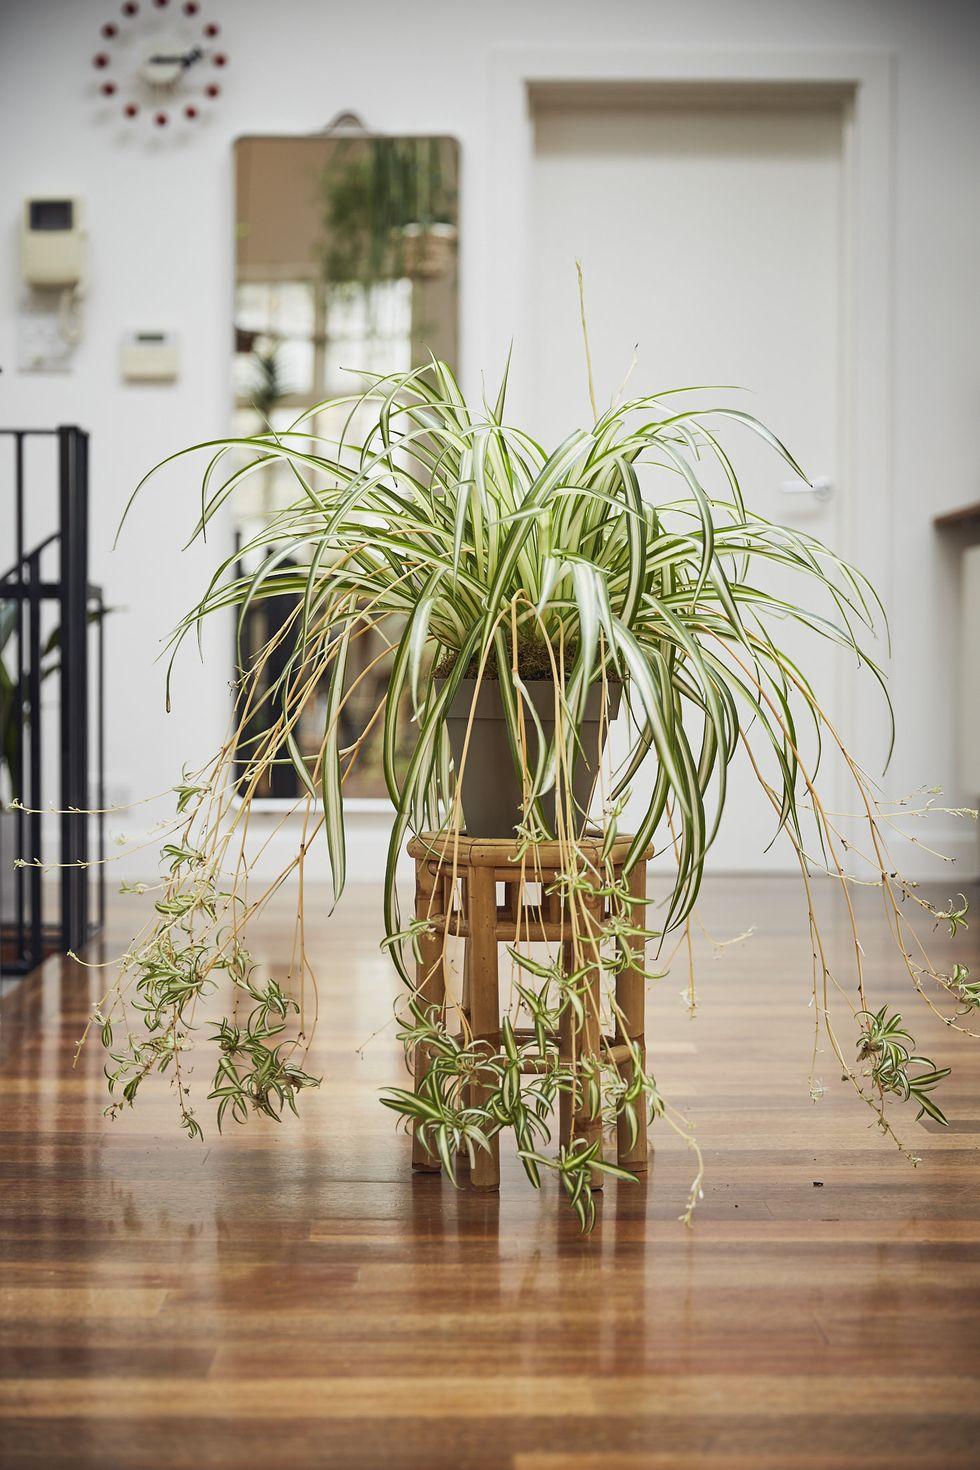 स्पाइडर प्लांट (Spider Plant)